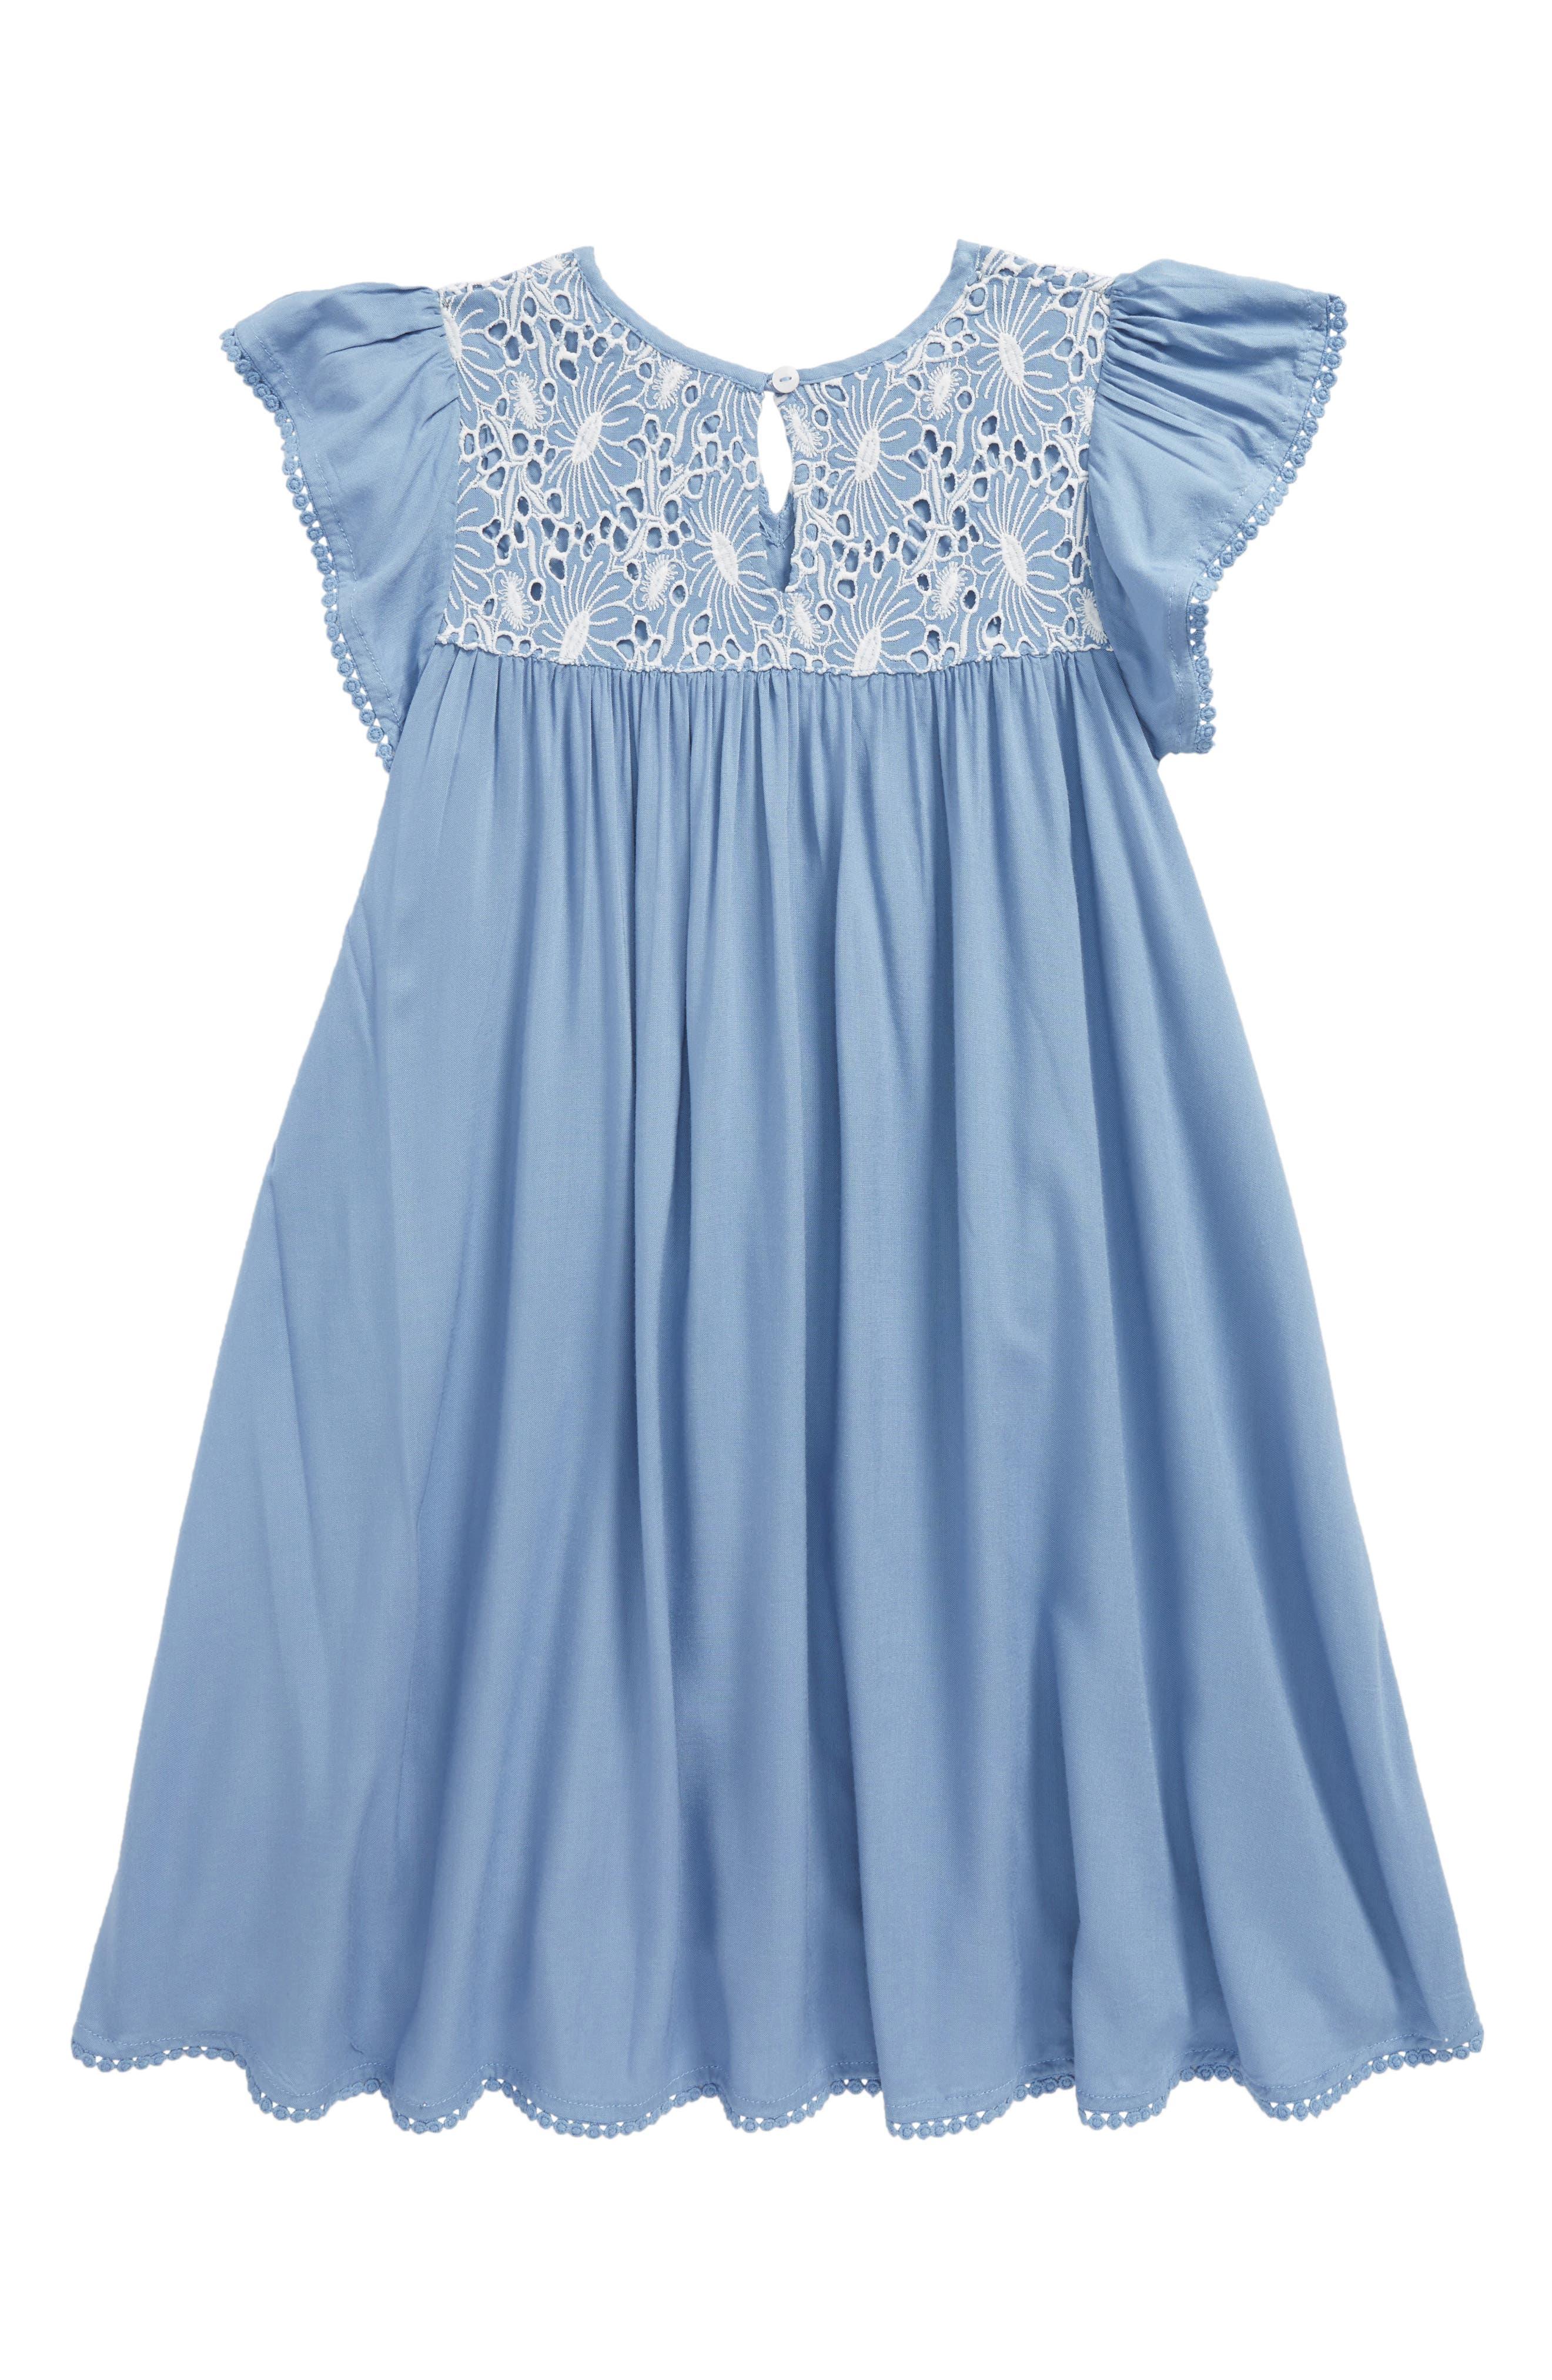 Embroidered Tassel Dress,                             Alternate thumbnail 2, color,                             420